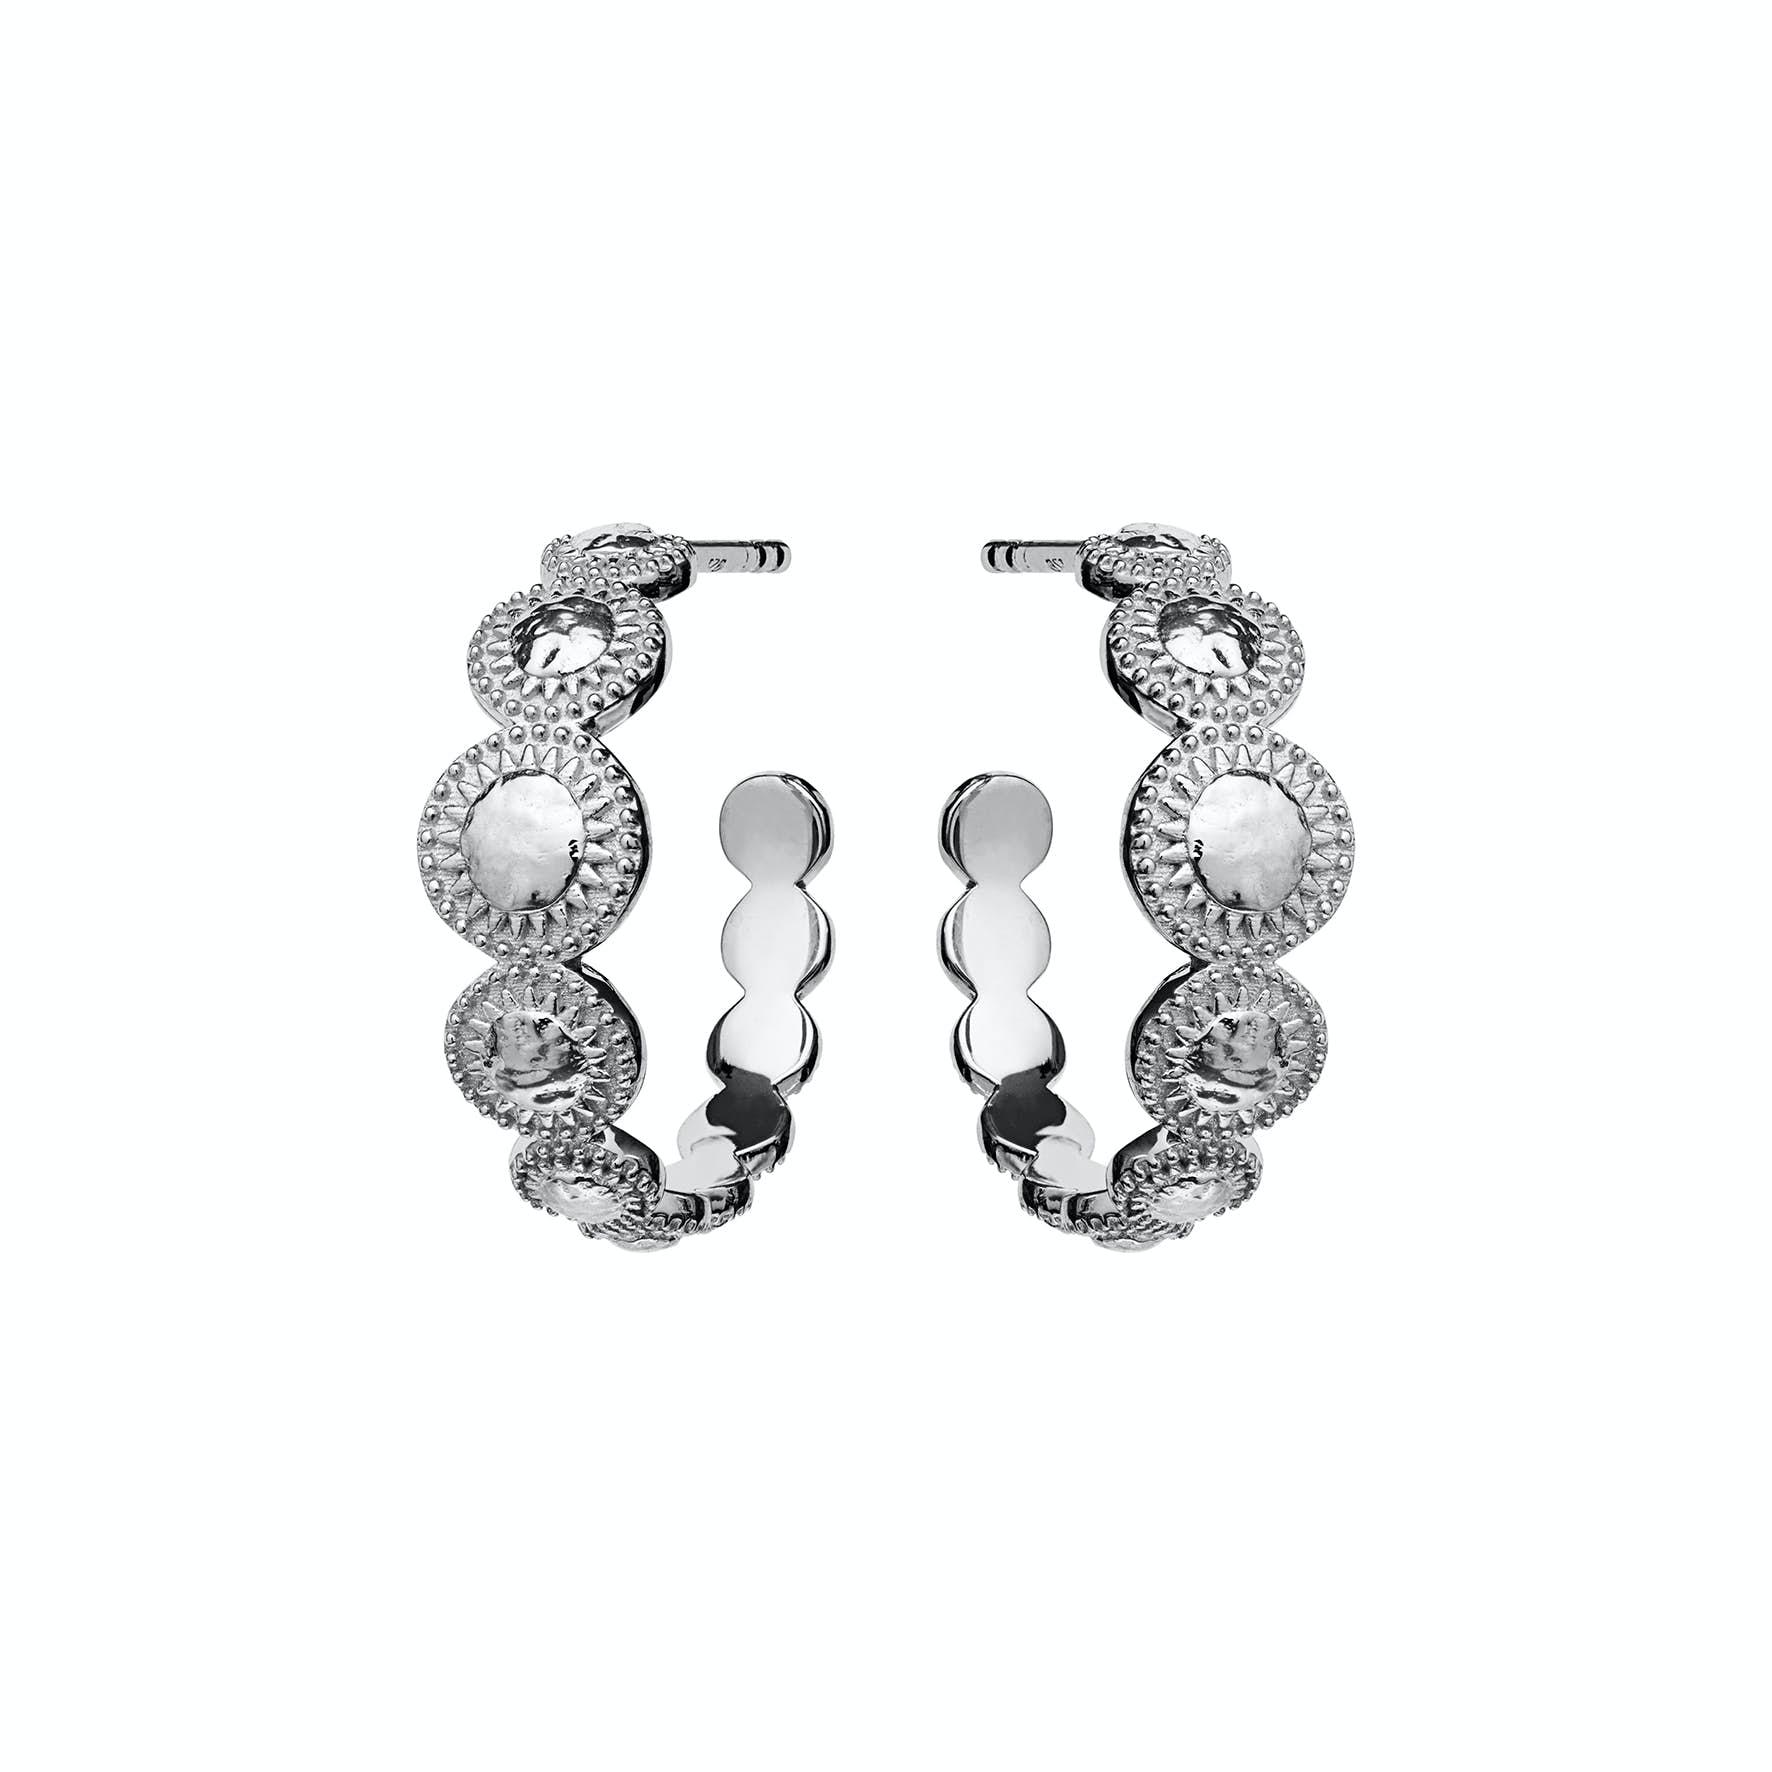 Tara Earrings von Maanesten in Silber Sterling 925